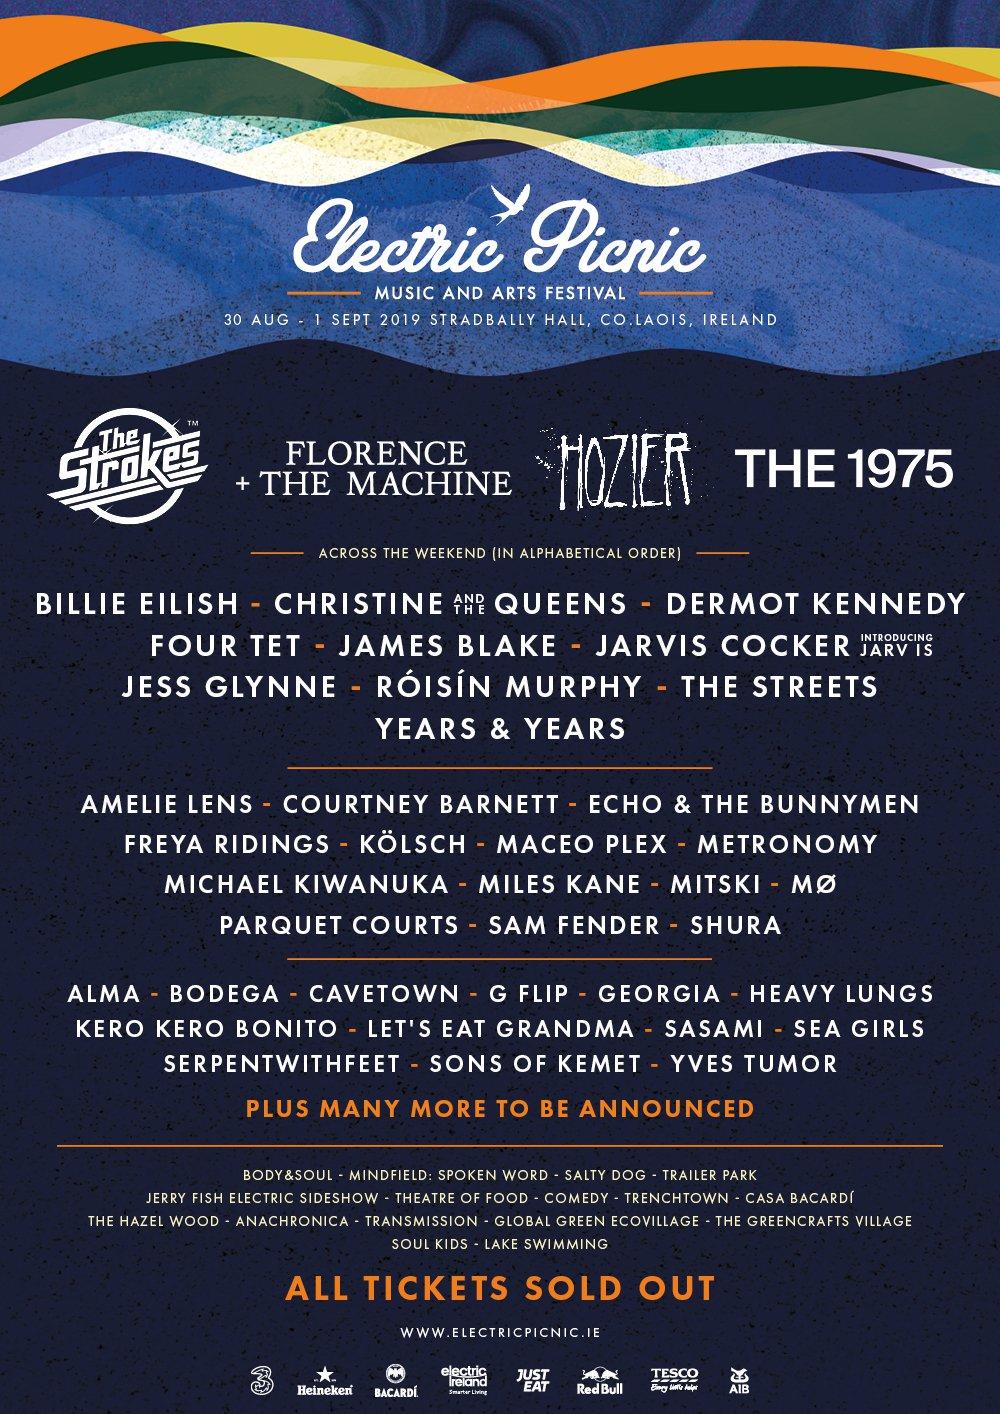 Electric Picnic 2019 lineup